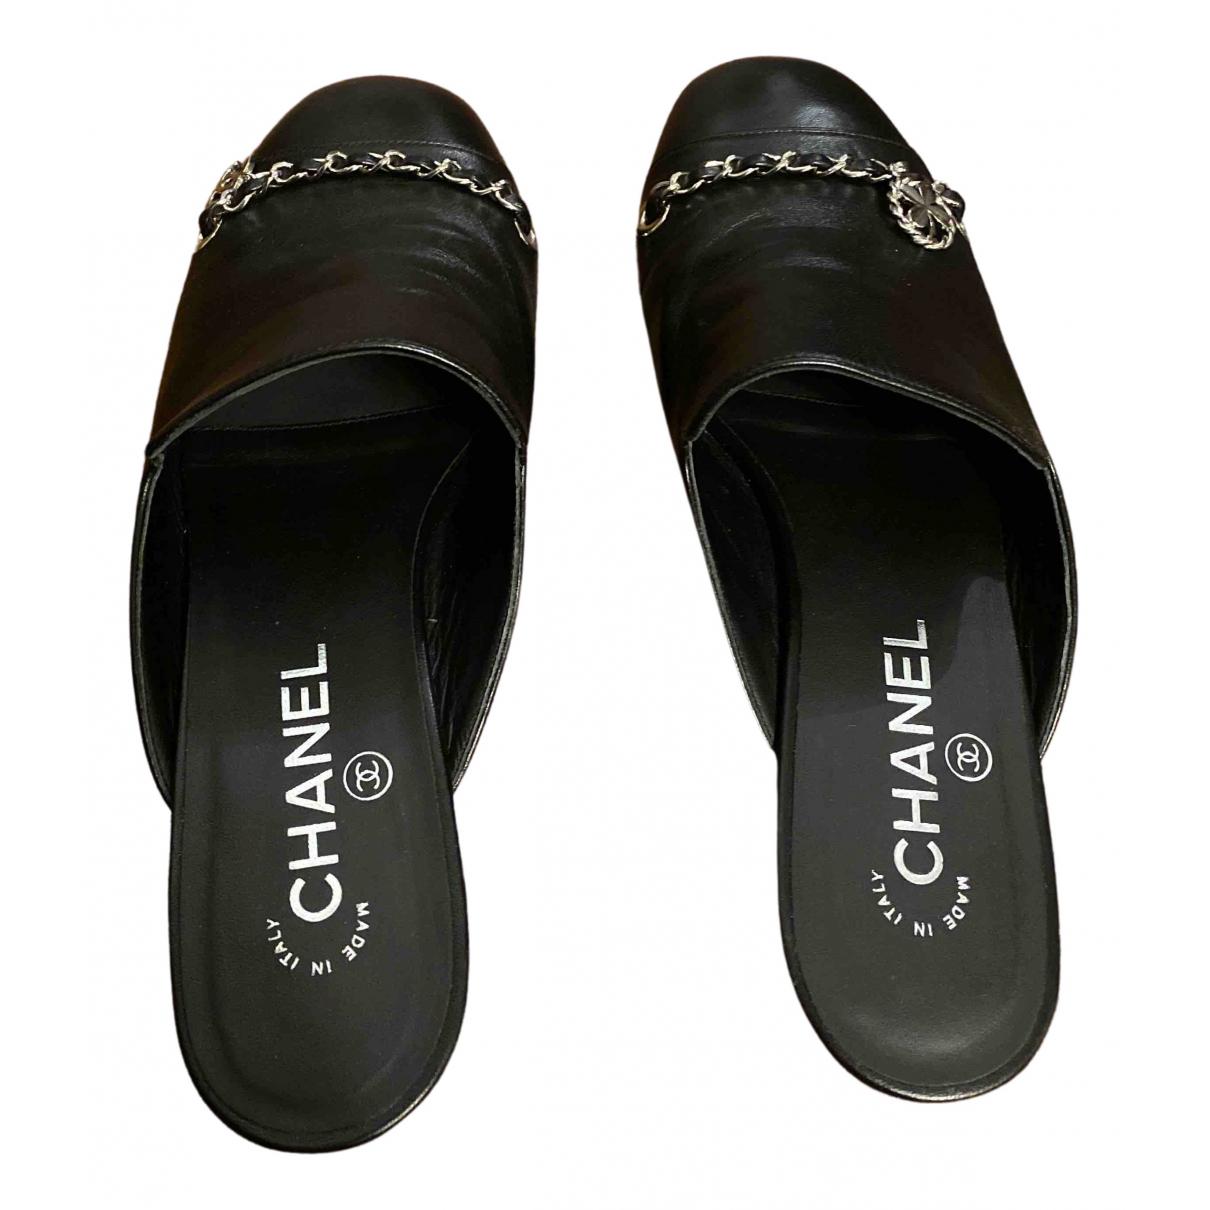 Chanel N Black Leather Sandals for Women 38 EU